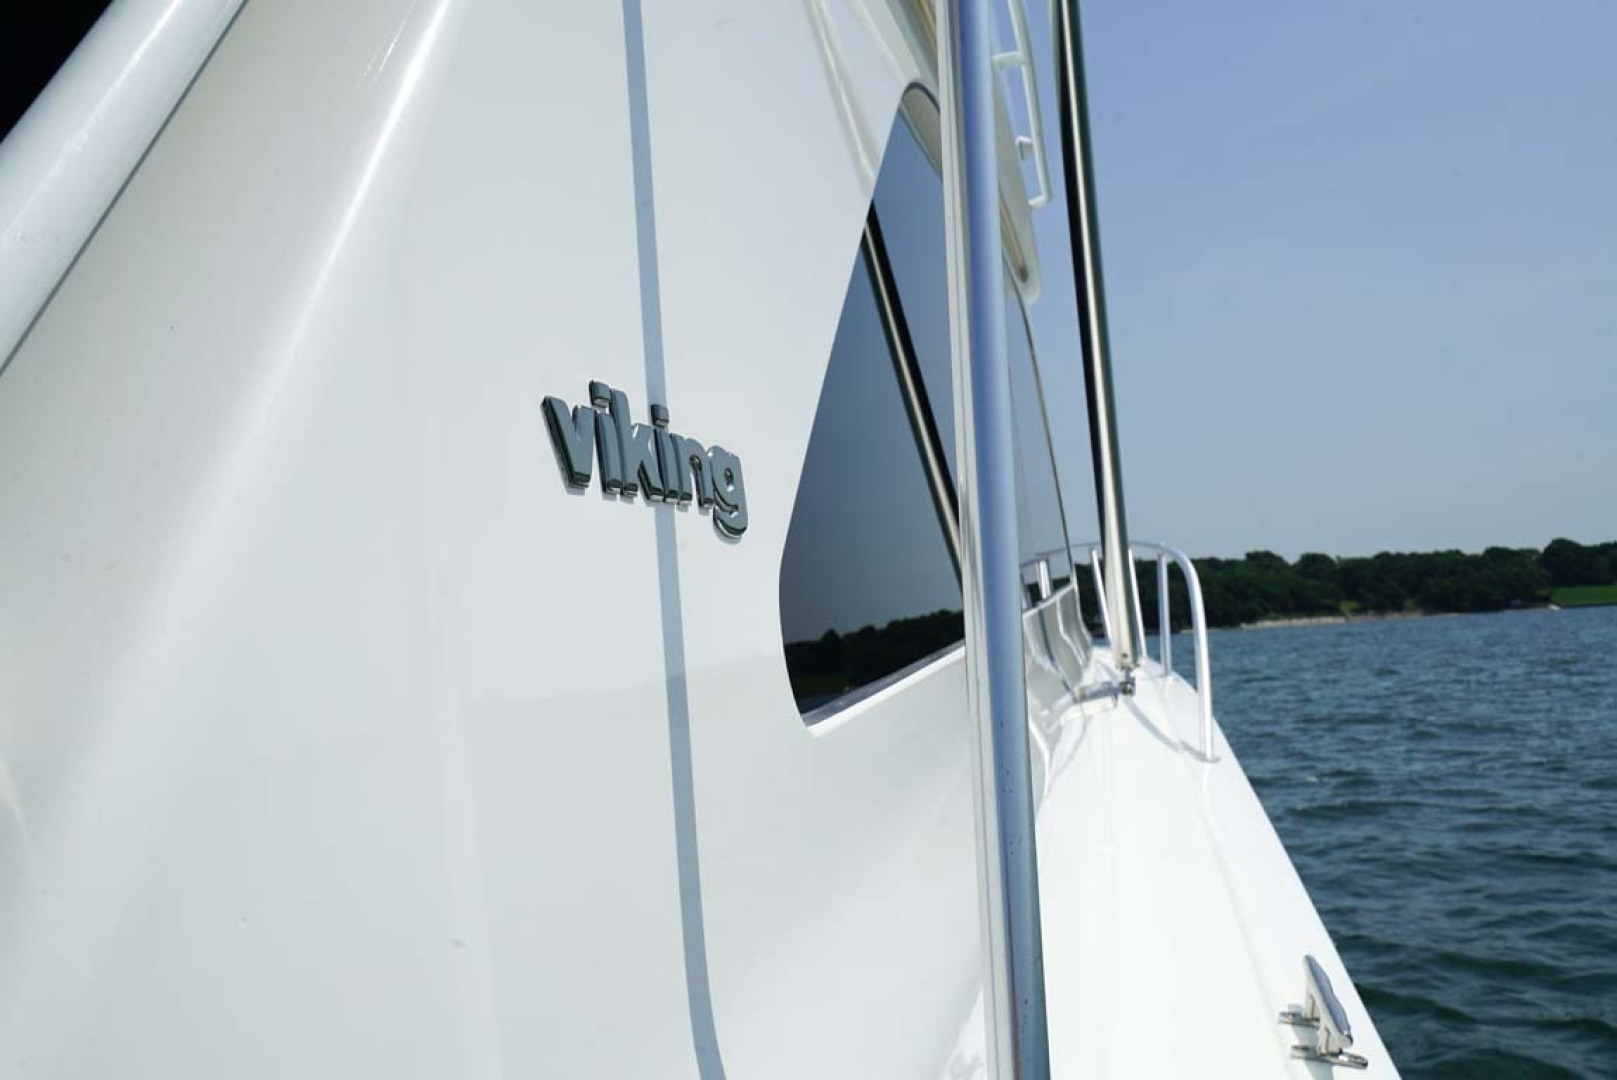 Viking-48 Convertible 2002-Sugaree PALM BEACH-Florida-United States-Starboard Deck-1348580 | Thumbnail